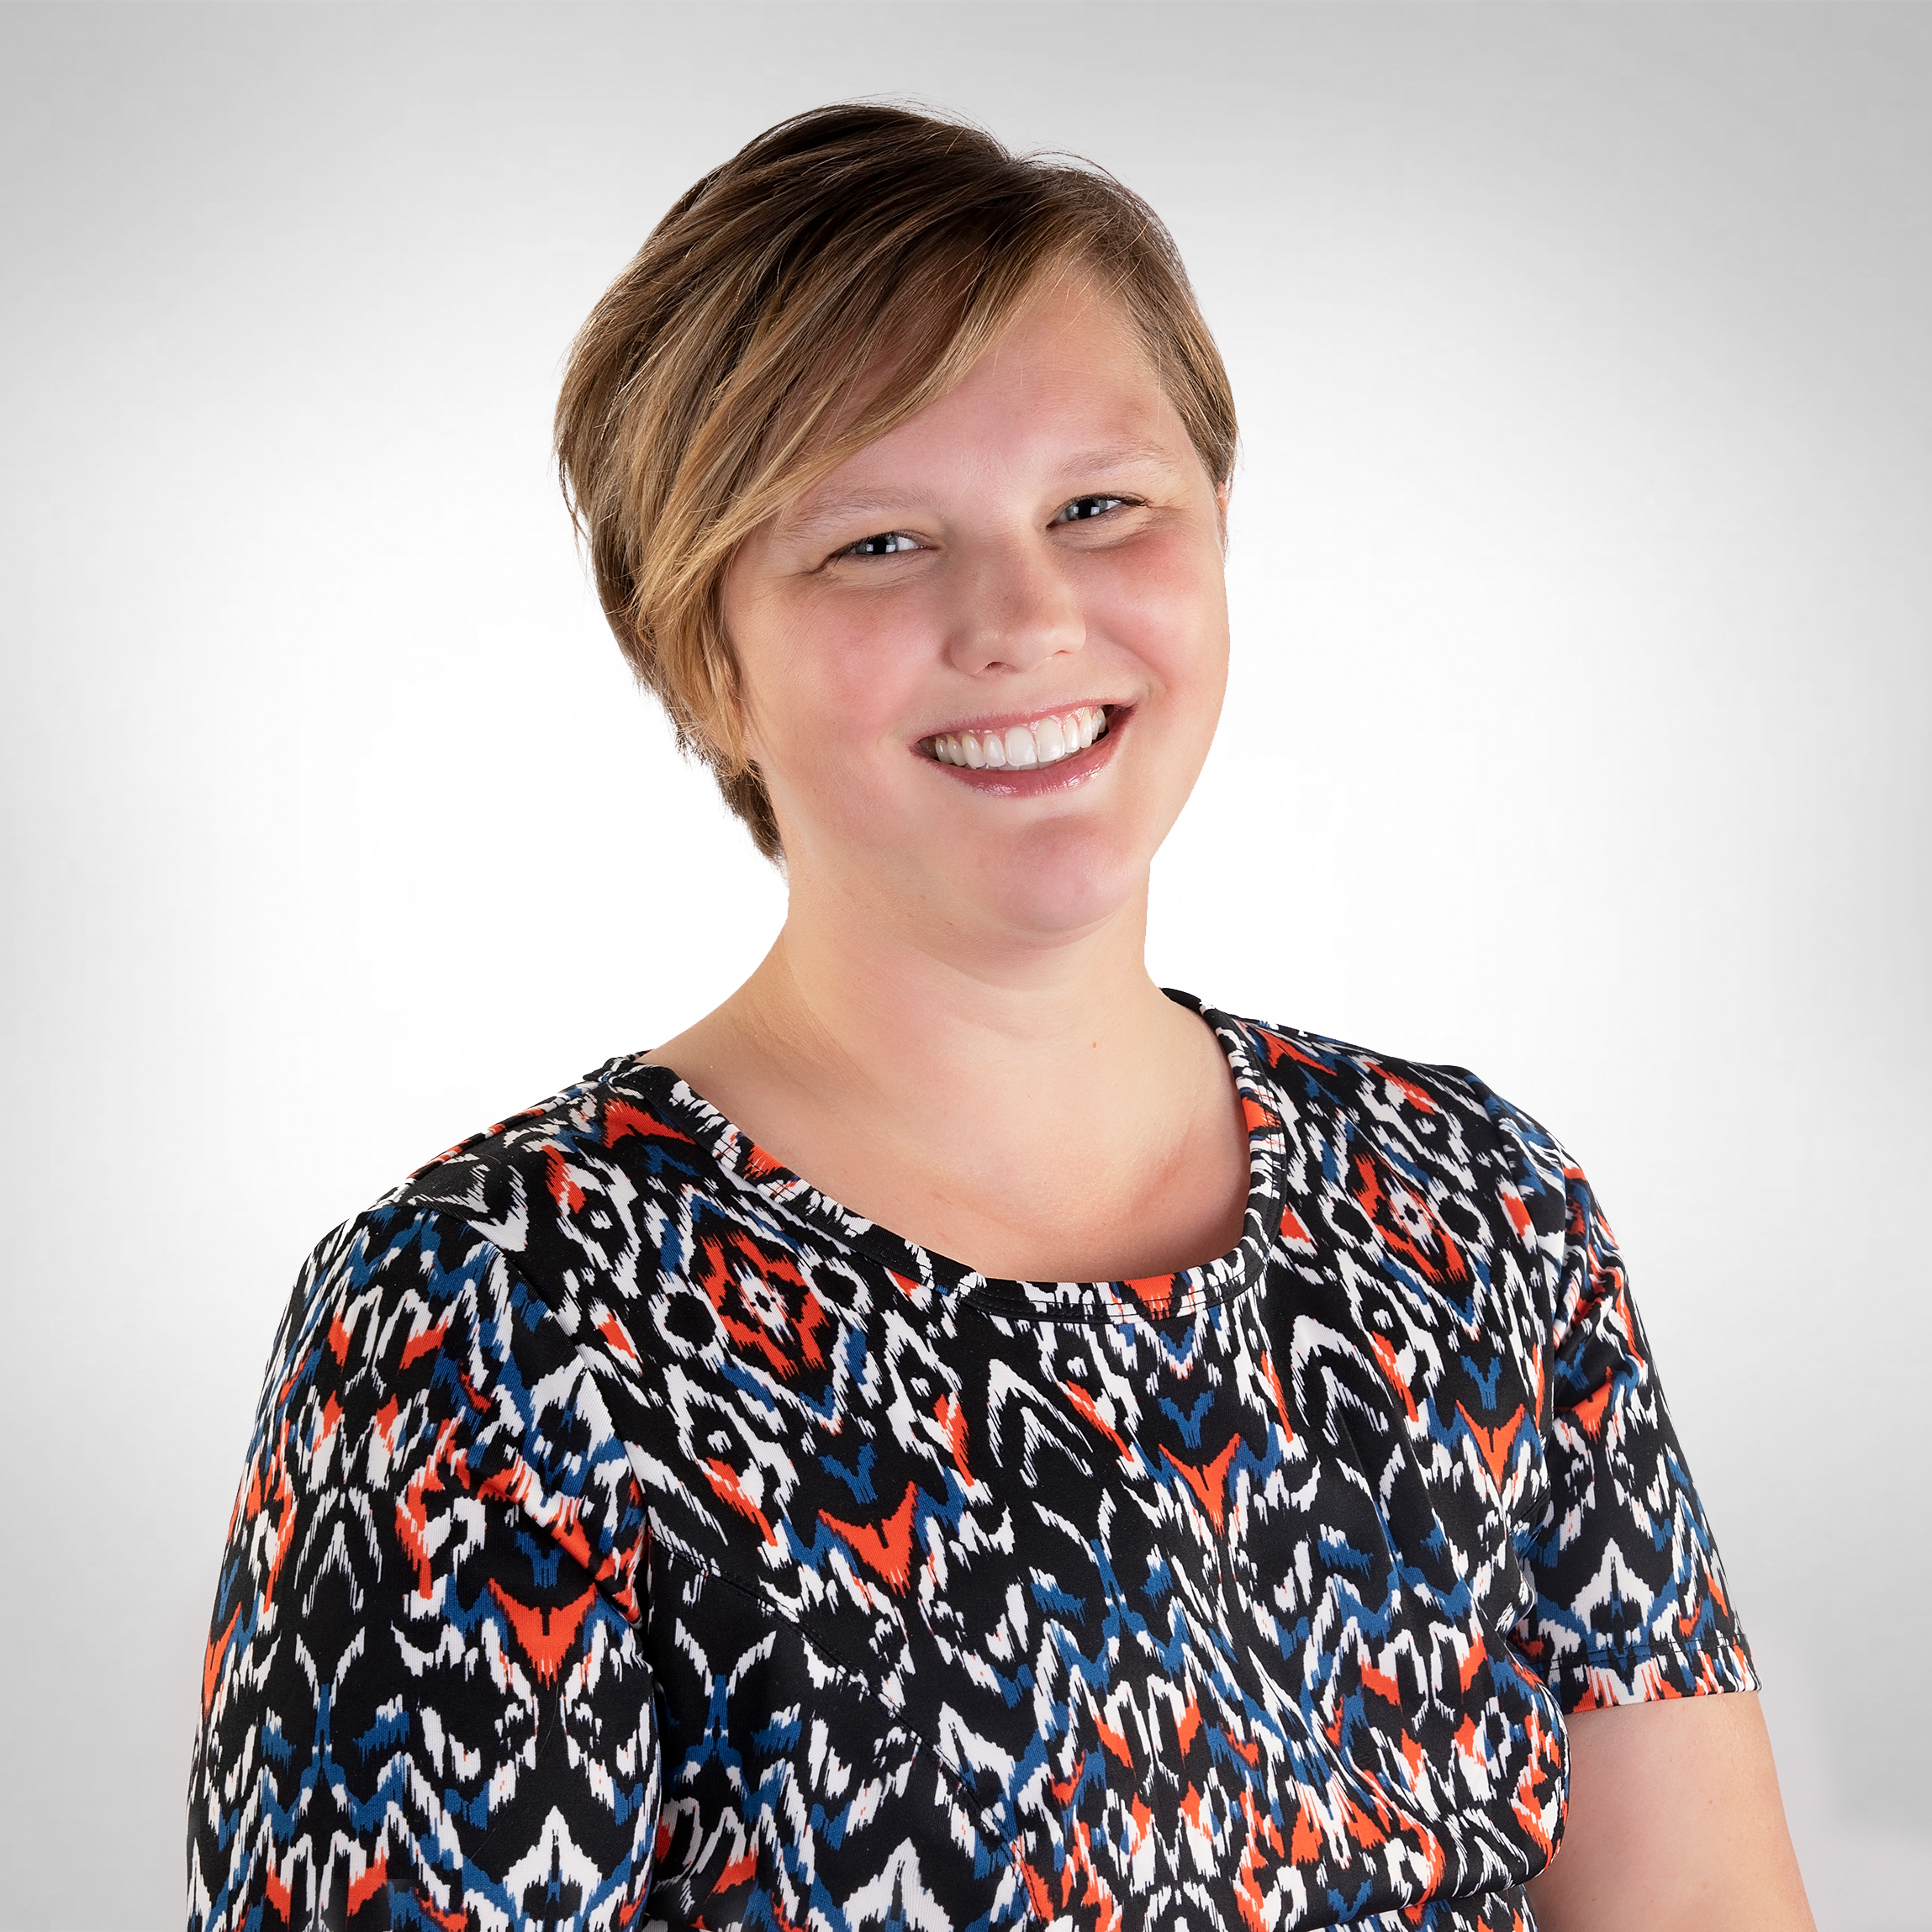 Katie Mazurek